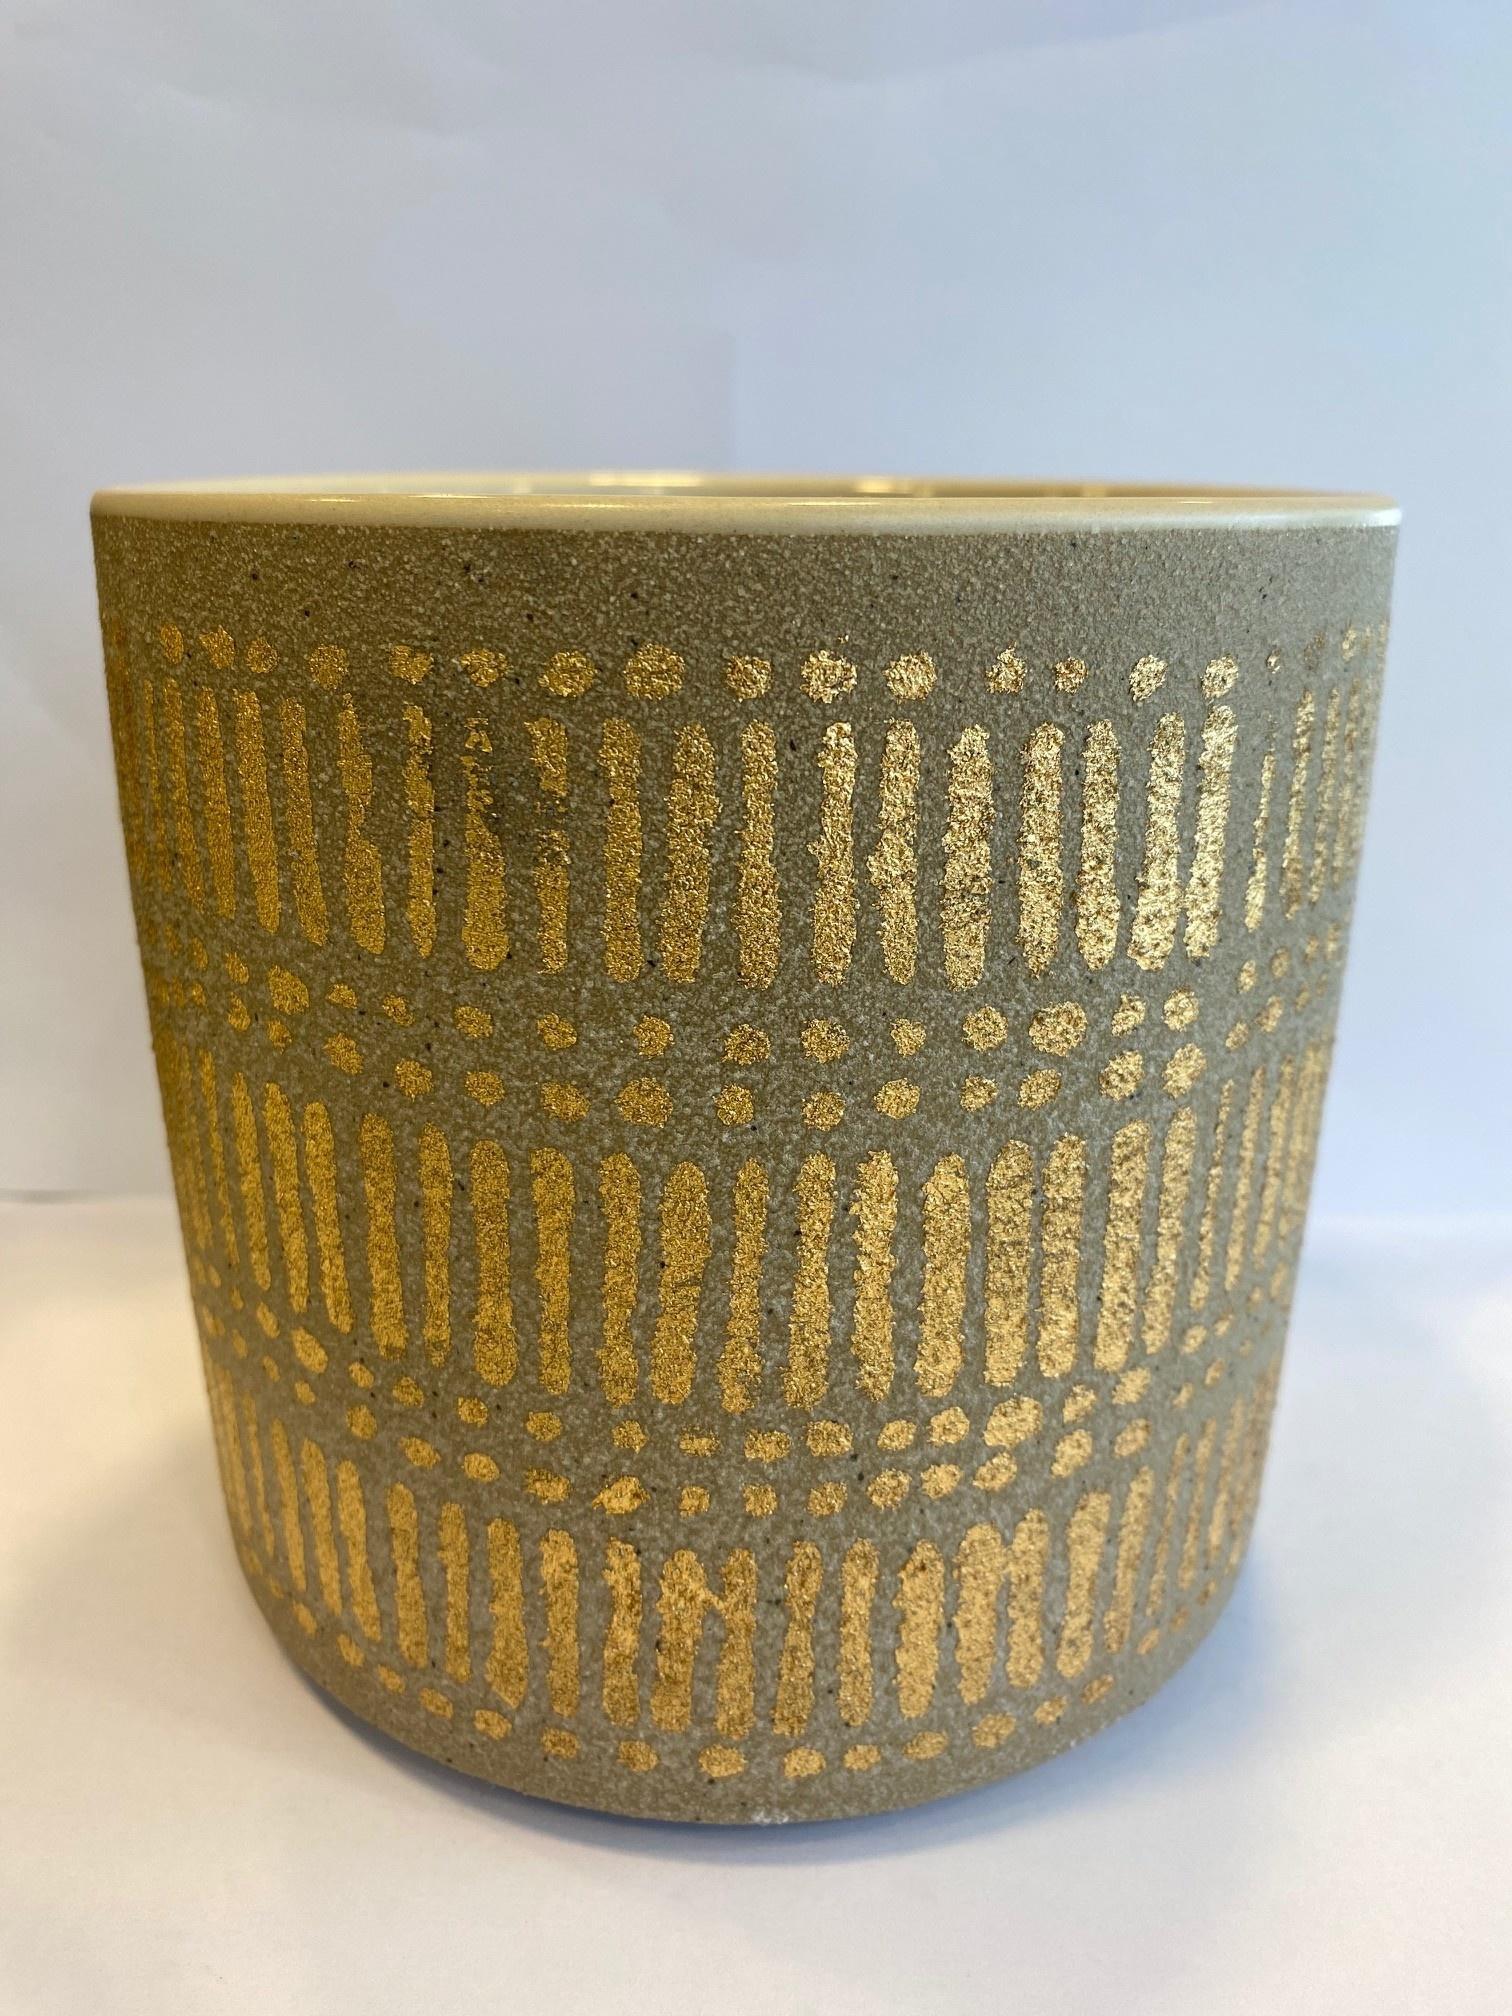 Bloempot Gouden Details - Medium-1